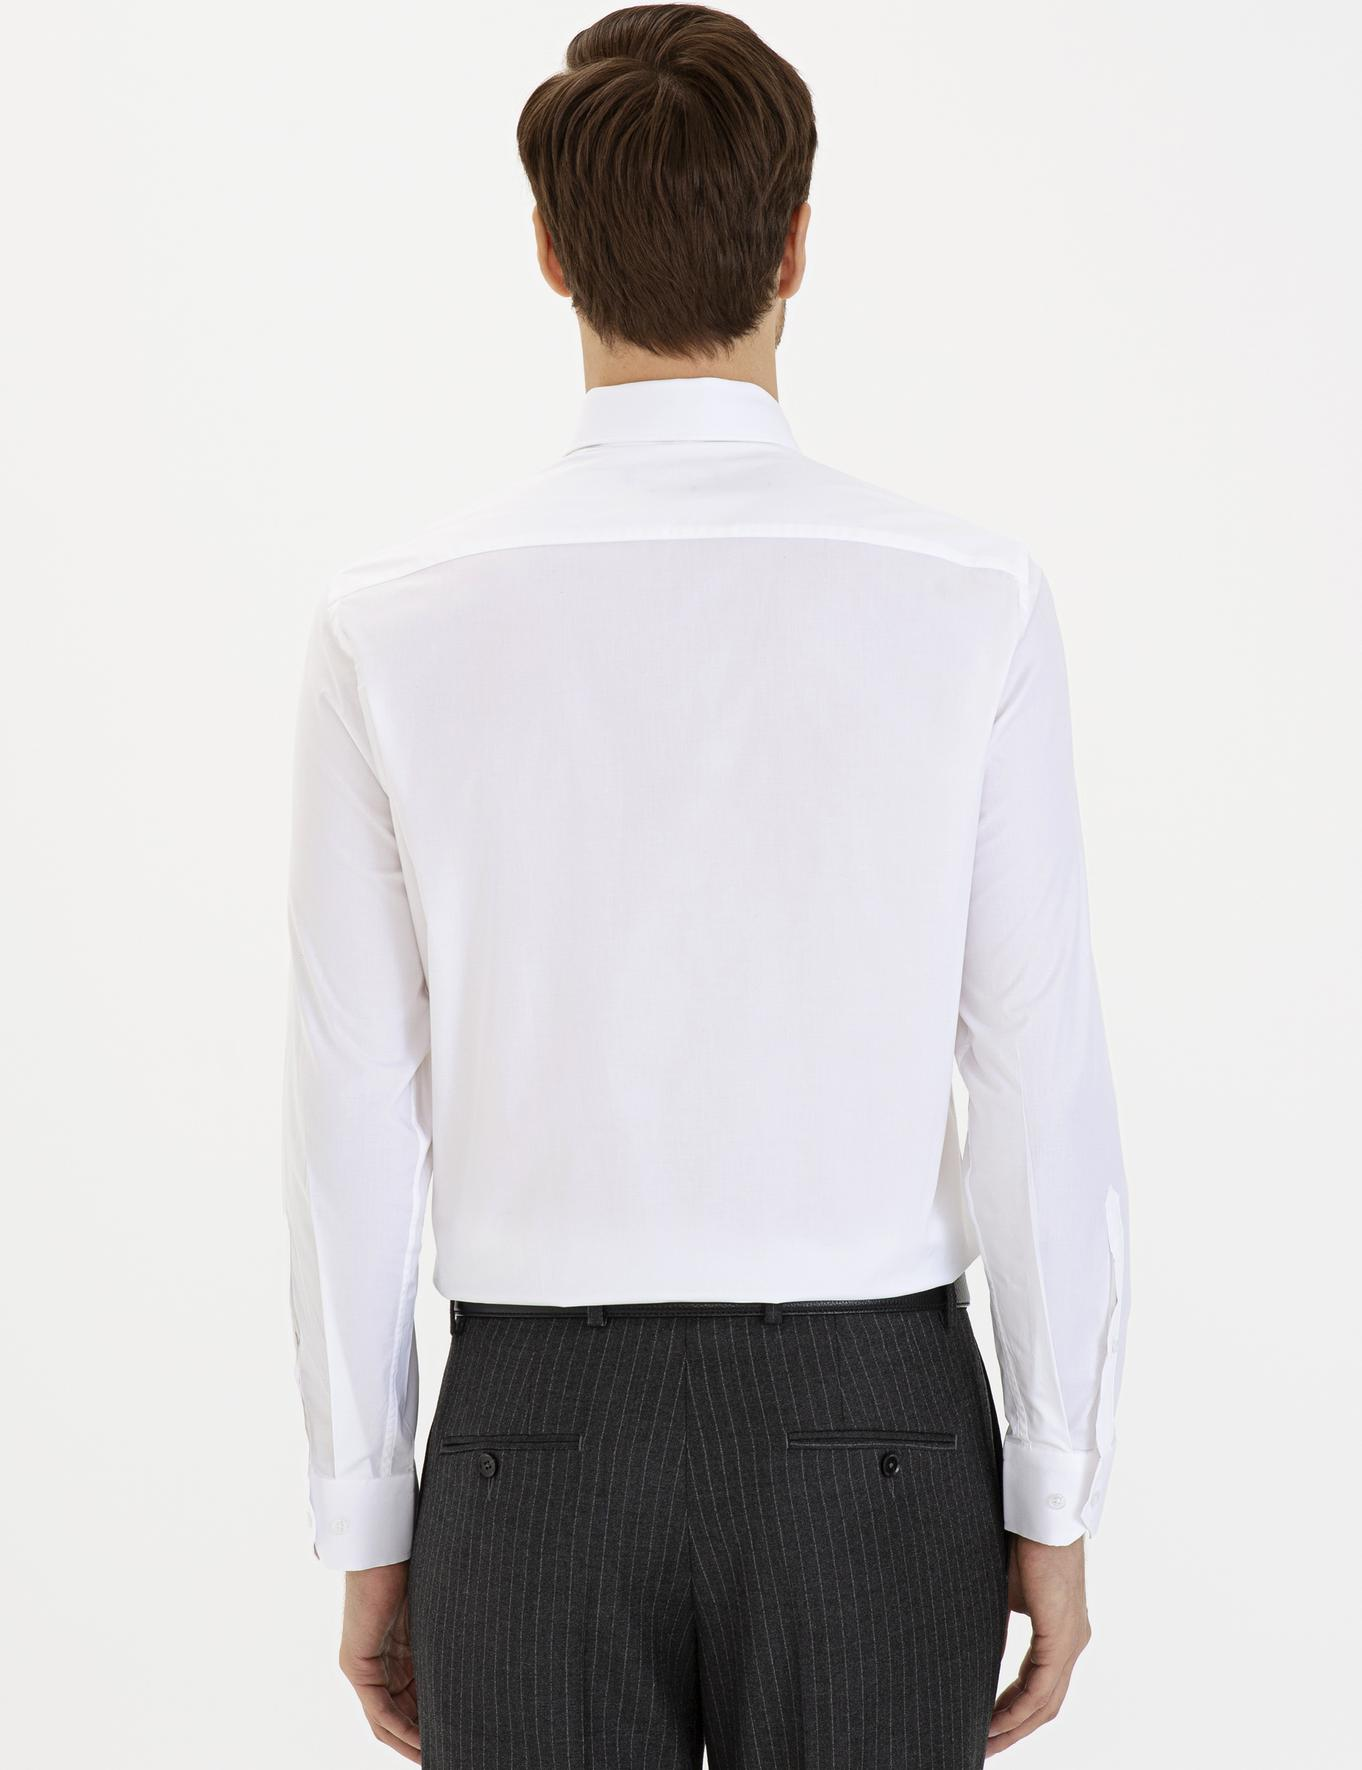 Beyaz Slim Fit Gömlek - 50229437011